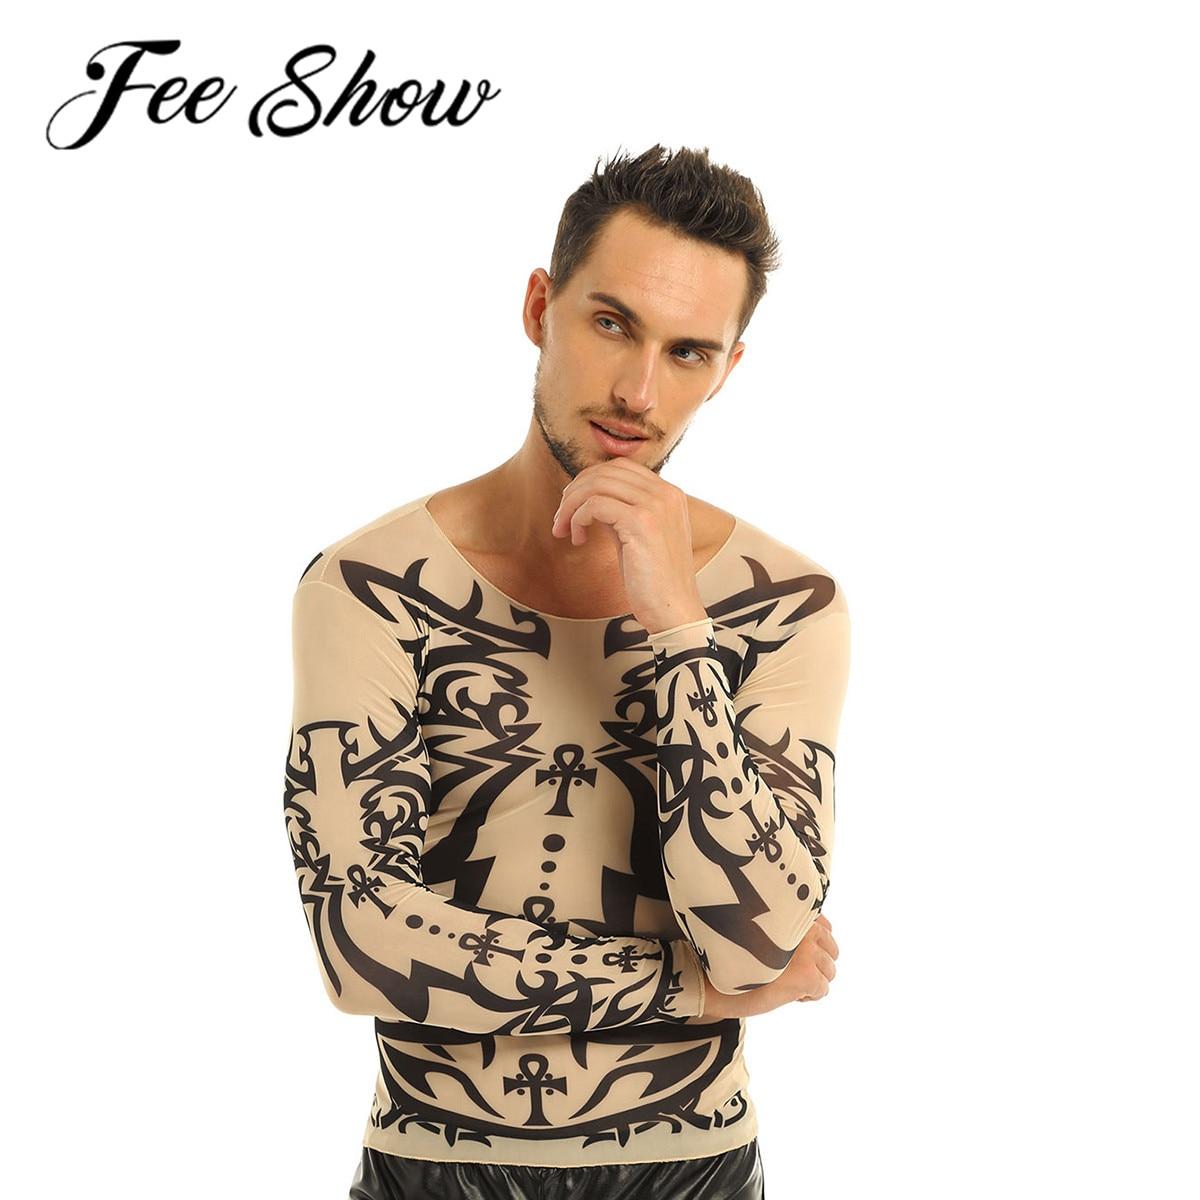 Camiseta de manga larga elástica con diseño de tatuaje falso de feesshow para hombre, Camiseta con cuello redondo y malla para disfraces de Halloween, camisetas de Carnaval